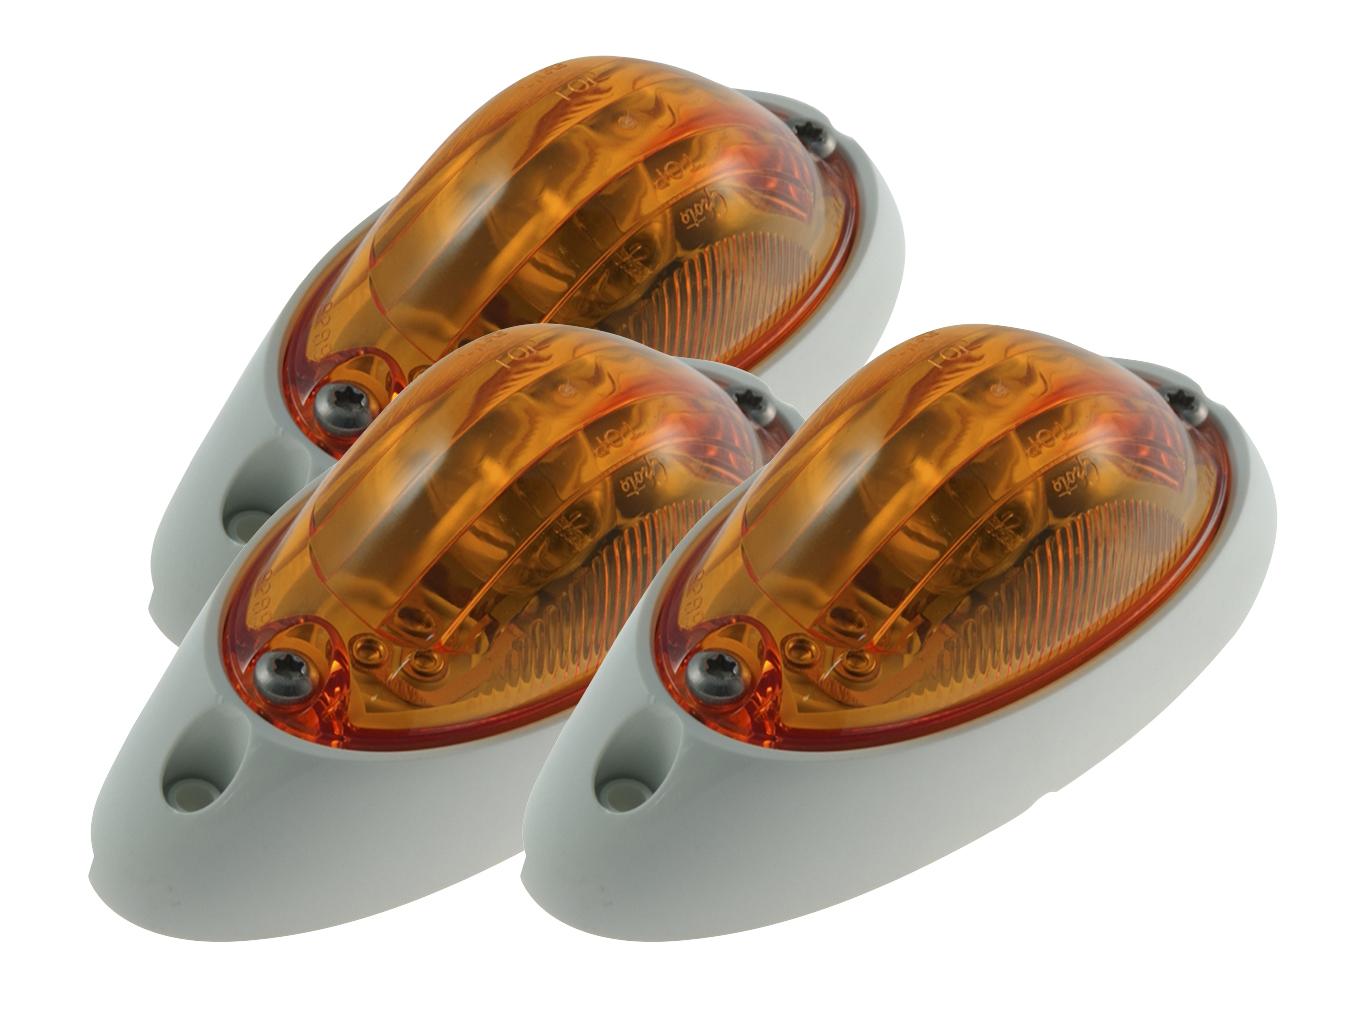 52063-3 – Small Aerodynamic Combination Marker Side Turn Light, White Base, Yellow, Bulk Pack